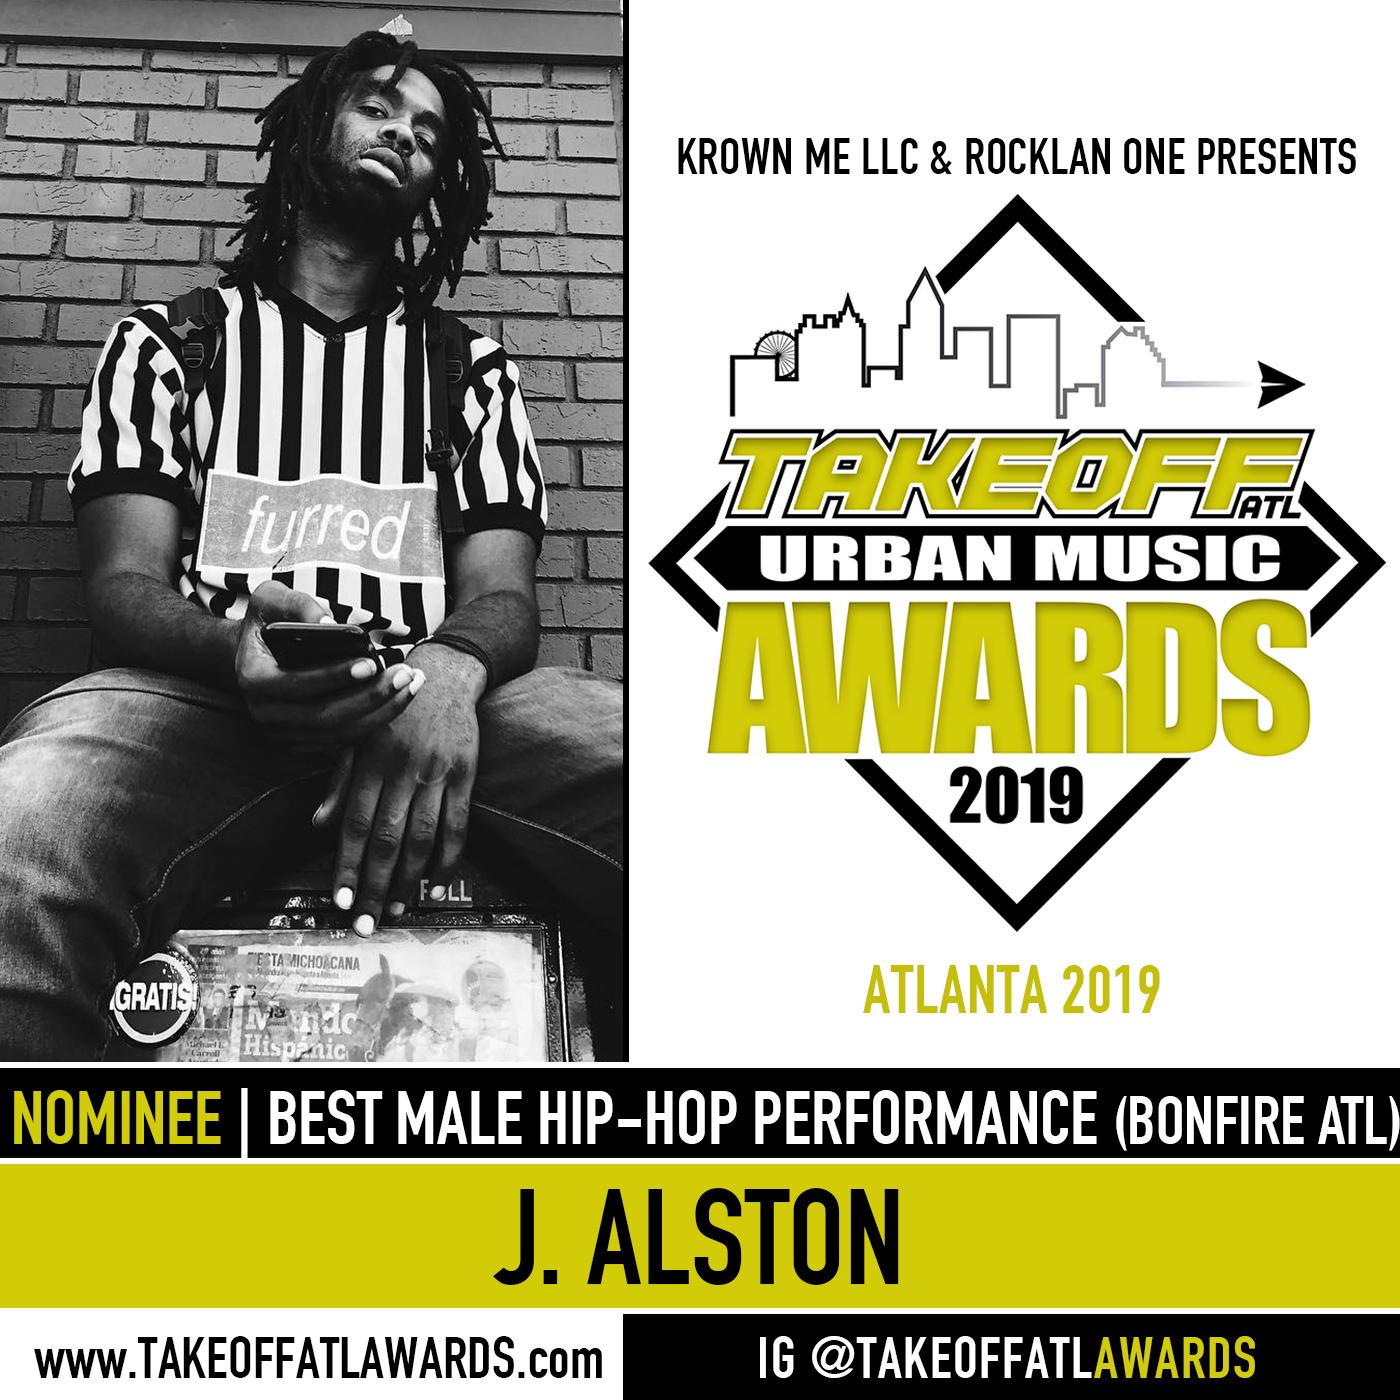 J. Alston